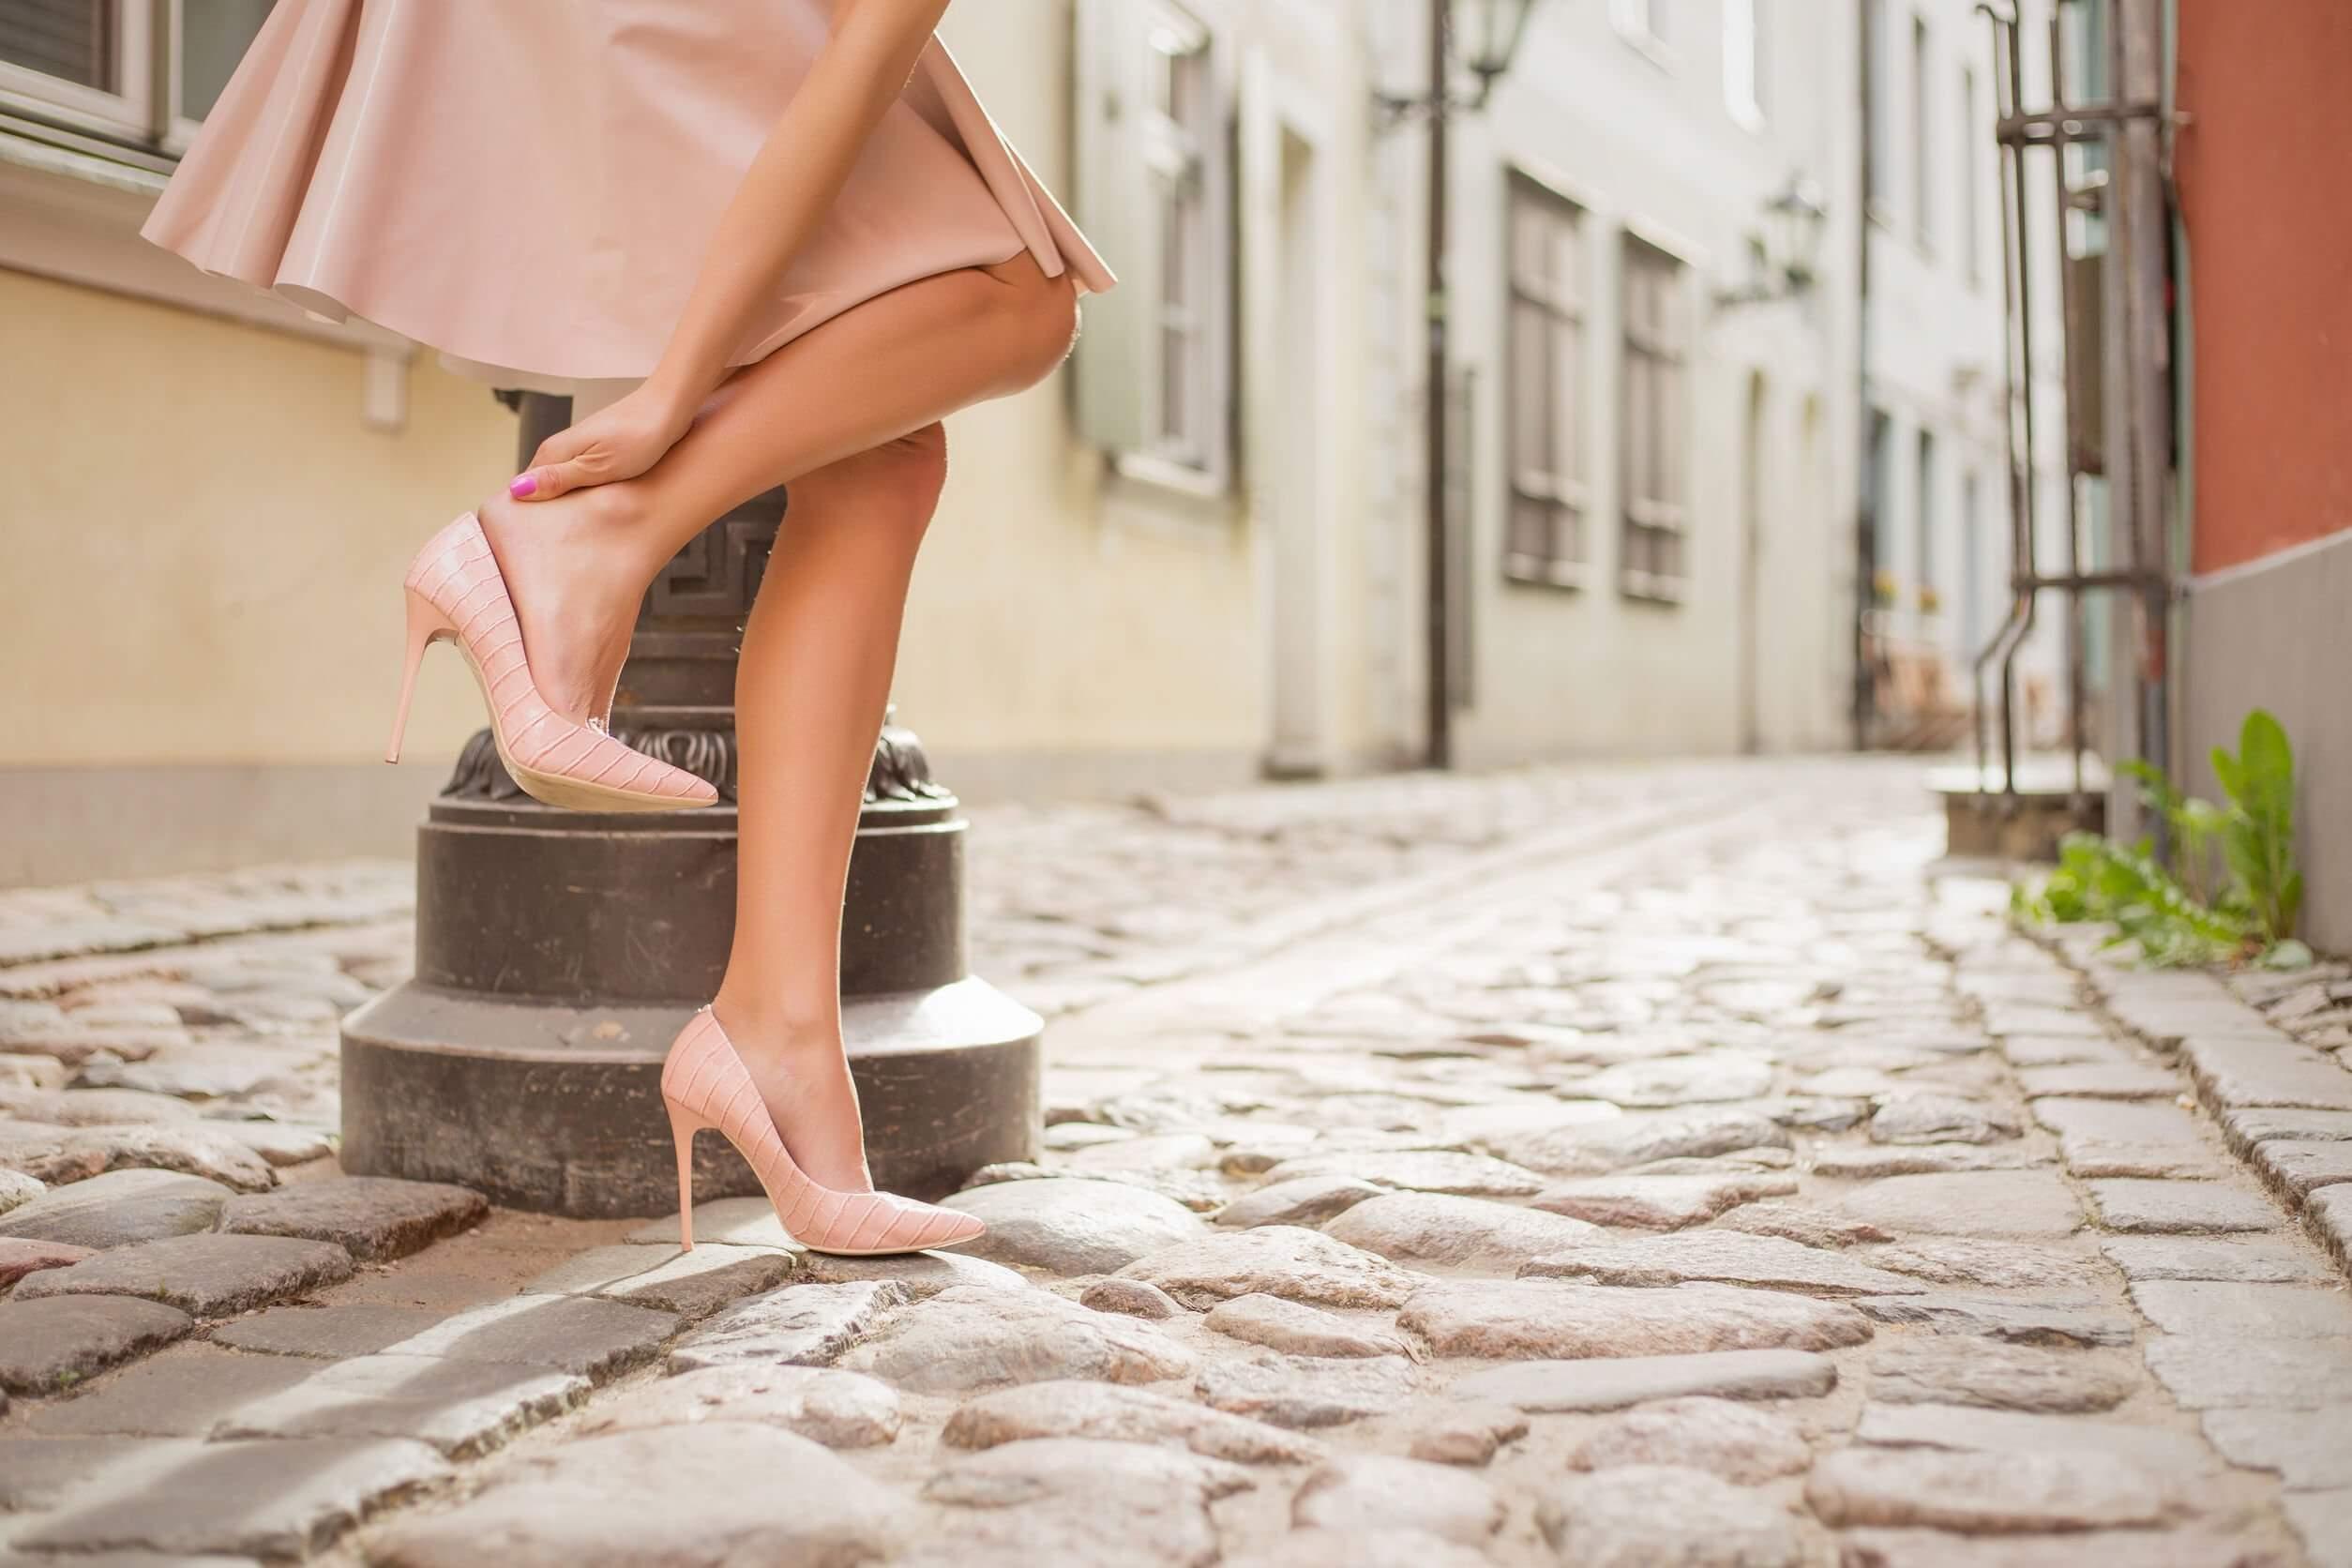 Como evitar calos nos pés: confira 7 dicas!